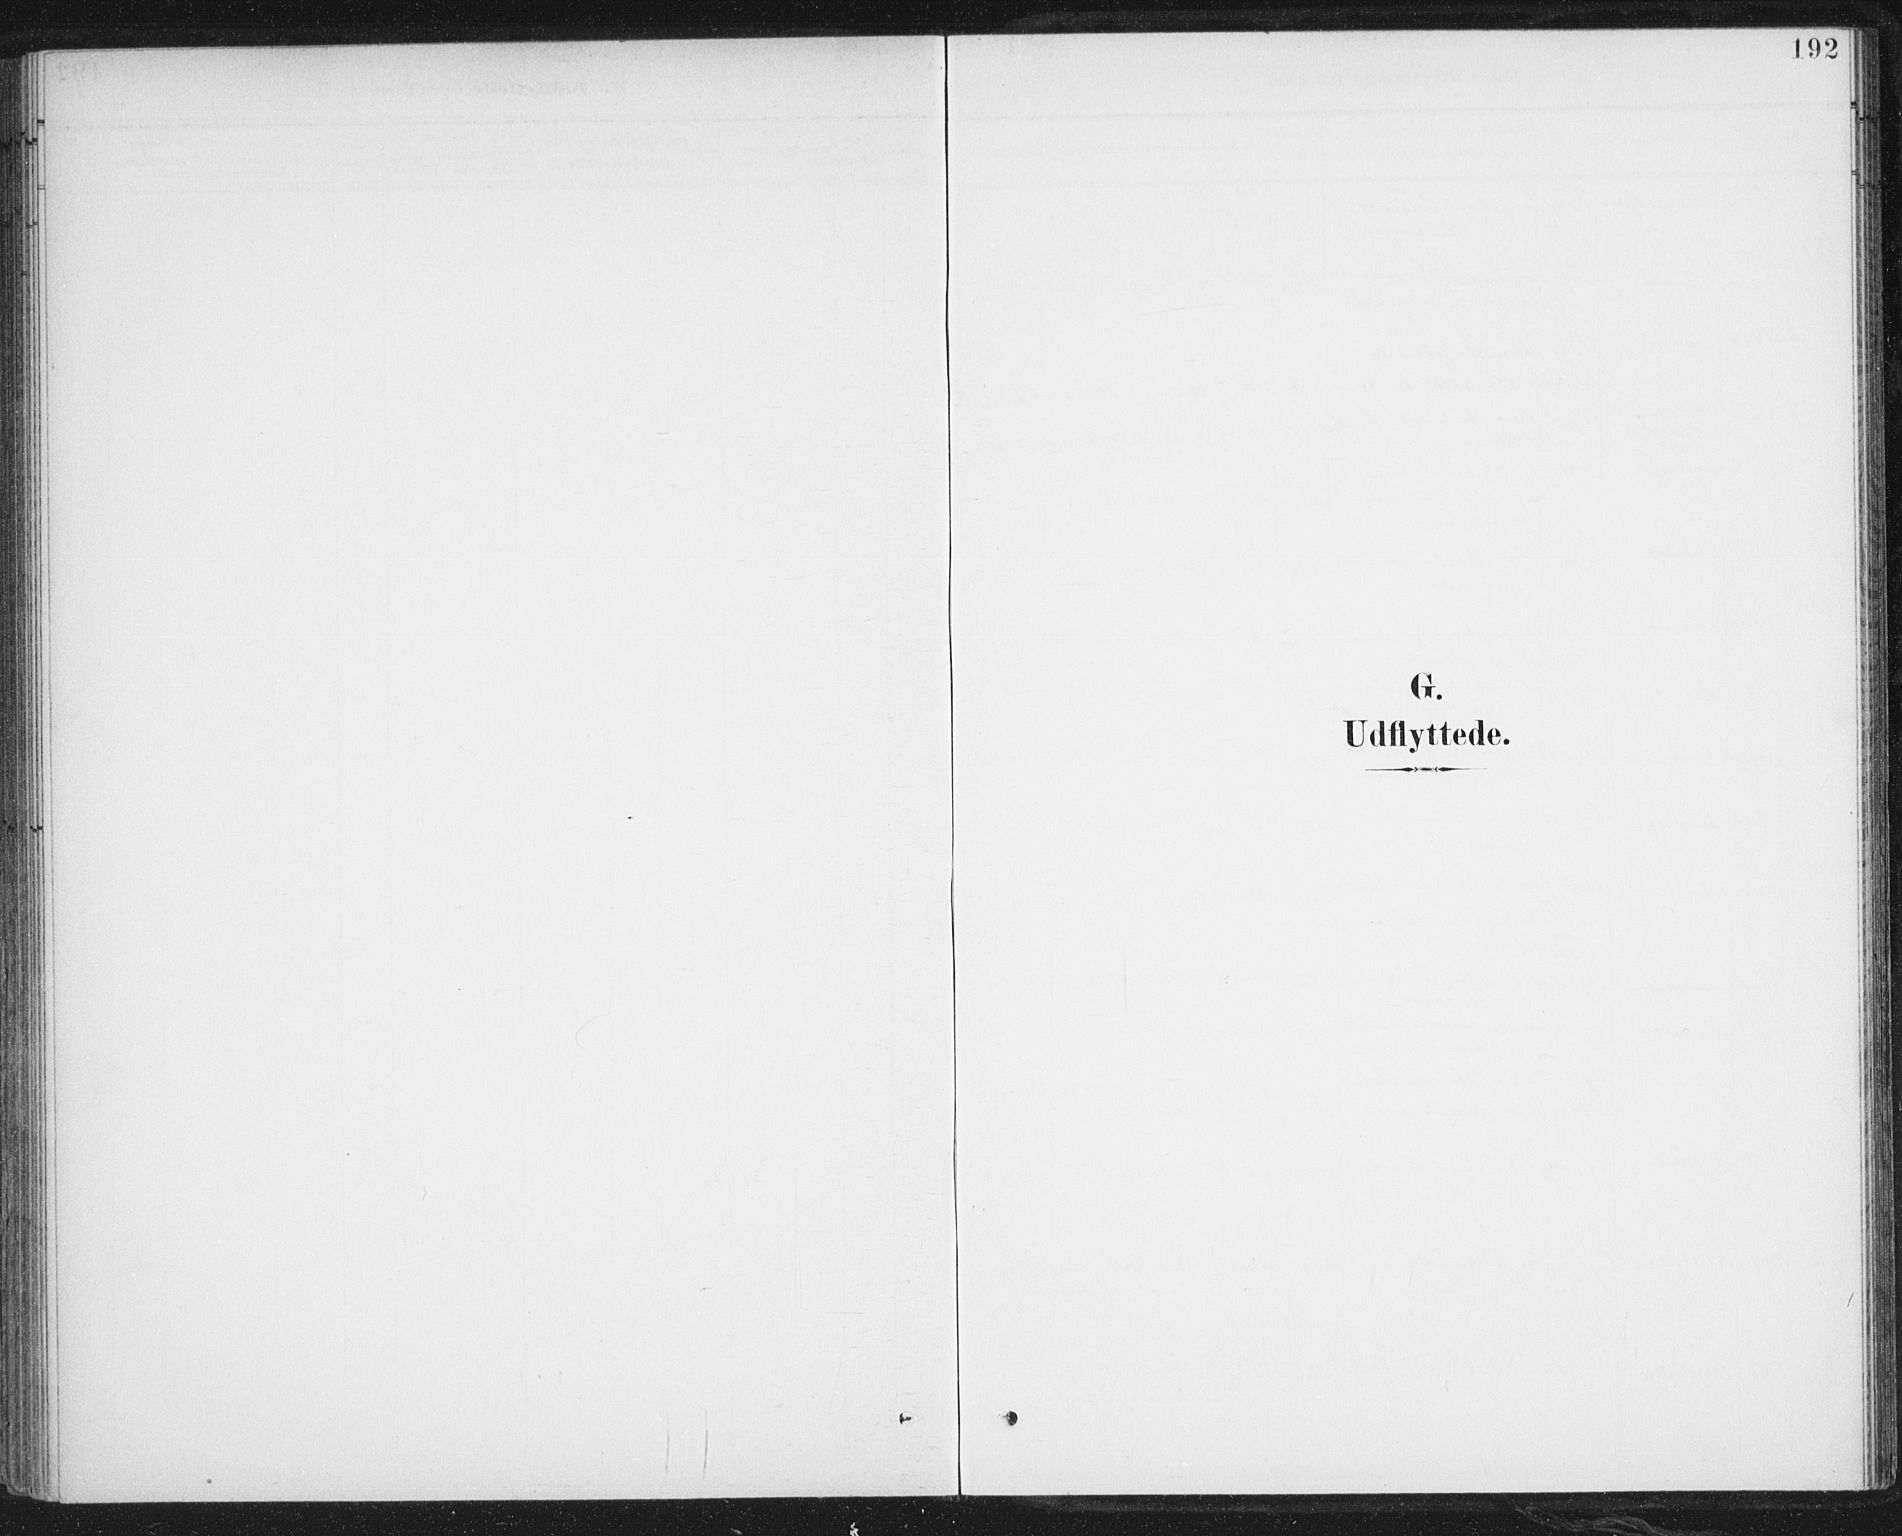 SAT, Ministerialprotokoller, klokkerbøker og fødselsregistre - Nordland, 899/L1437: Ministerialbok nr. 899A05, 1897-1908, s. 192